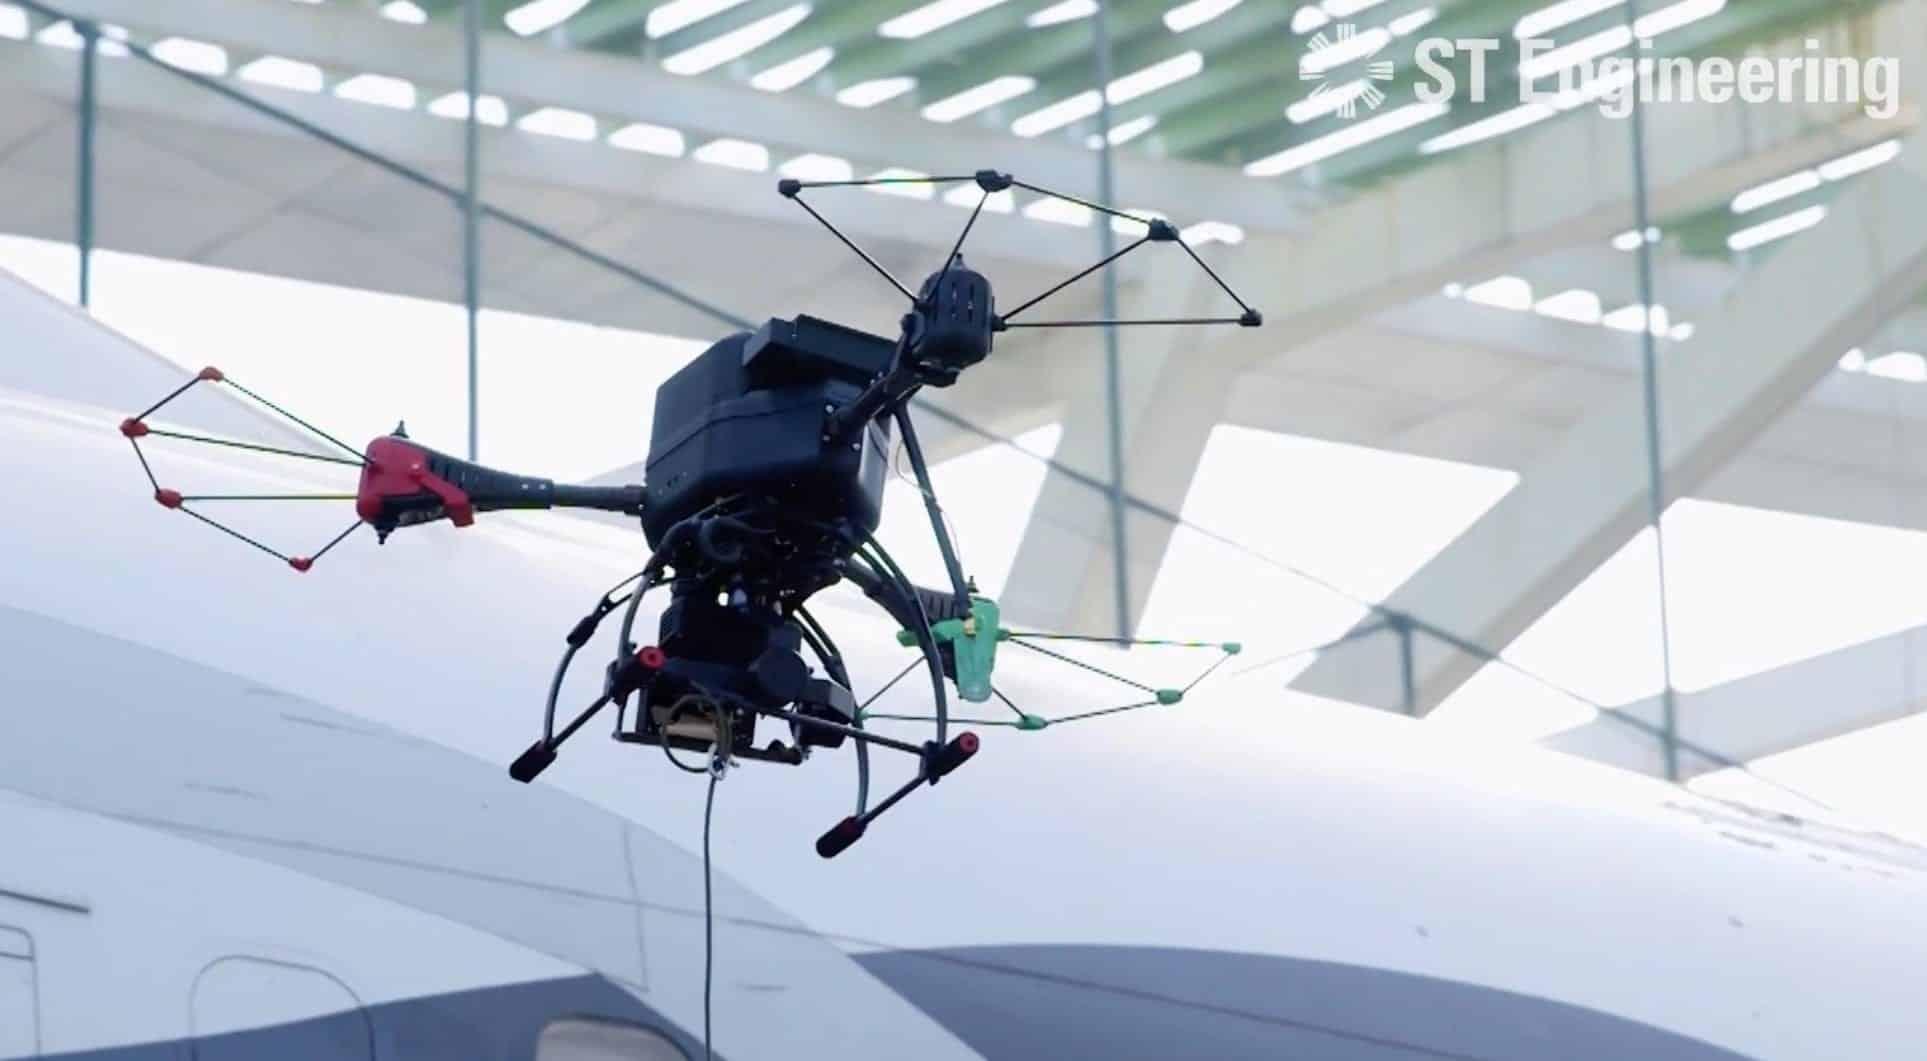 Drone solution makes aircraft hangar a smart facility